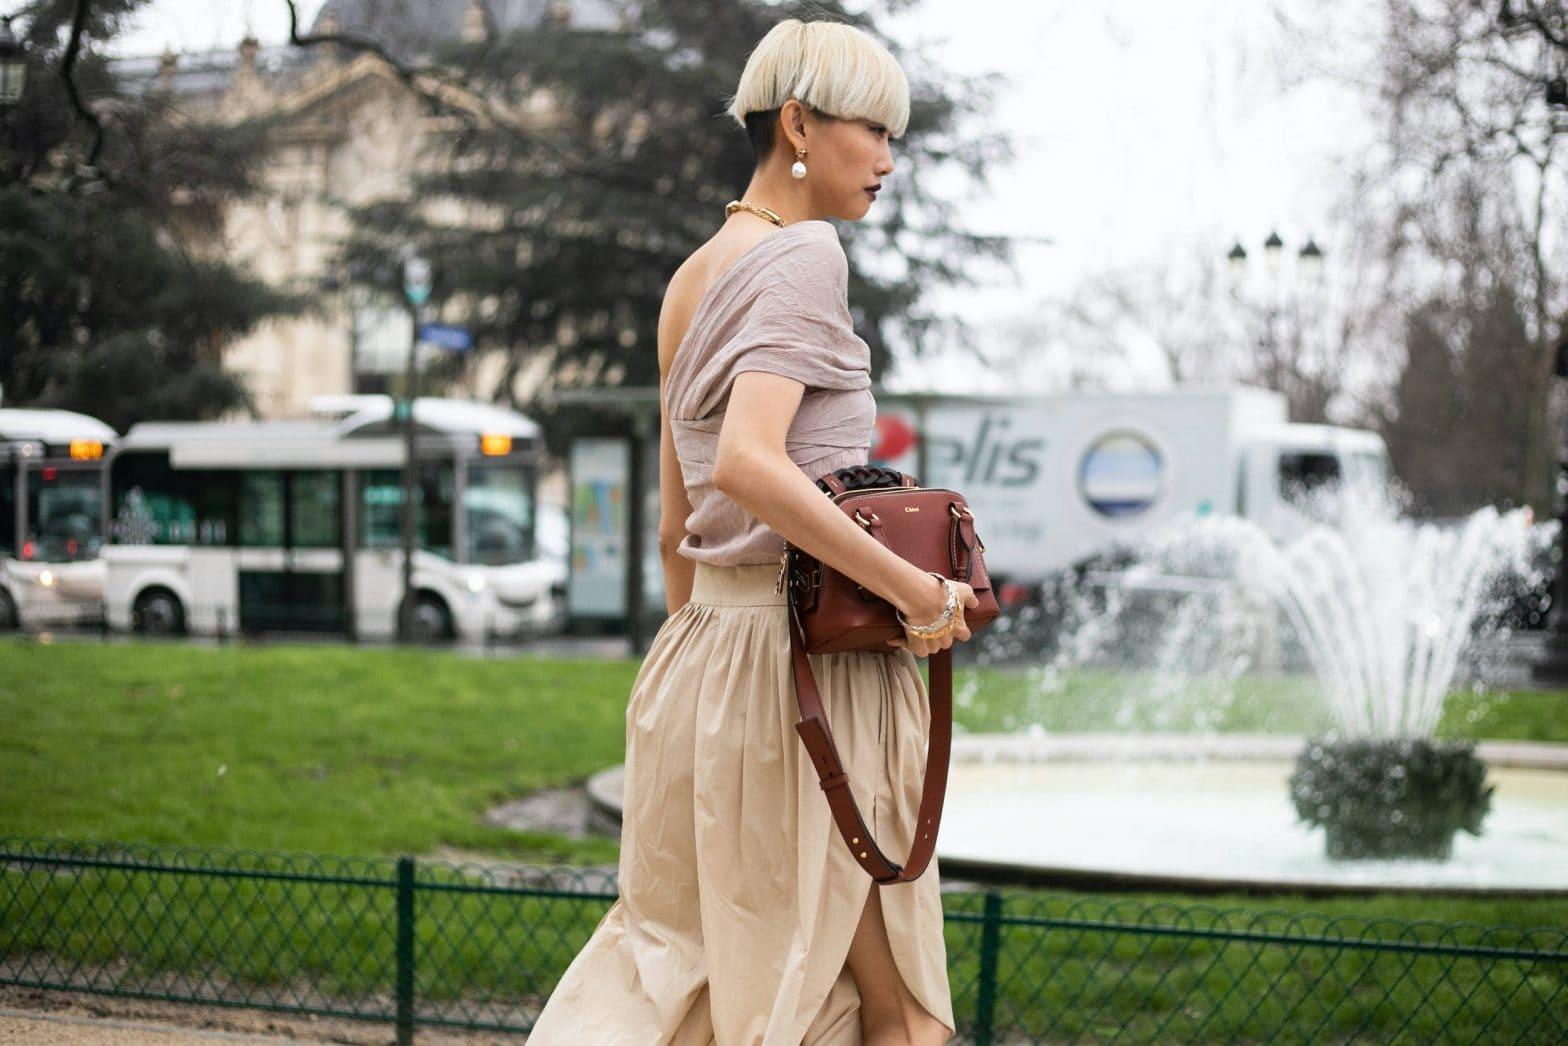 French Bangs & Co: An diesen Trendfrisuren kommst du 2021 ...